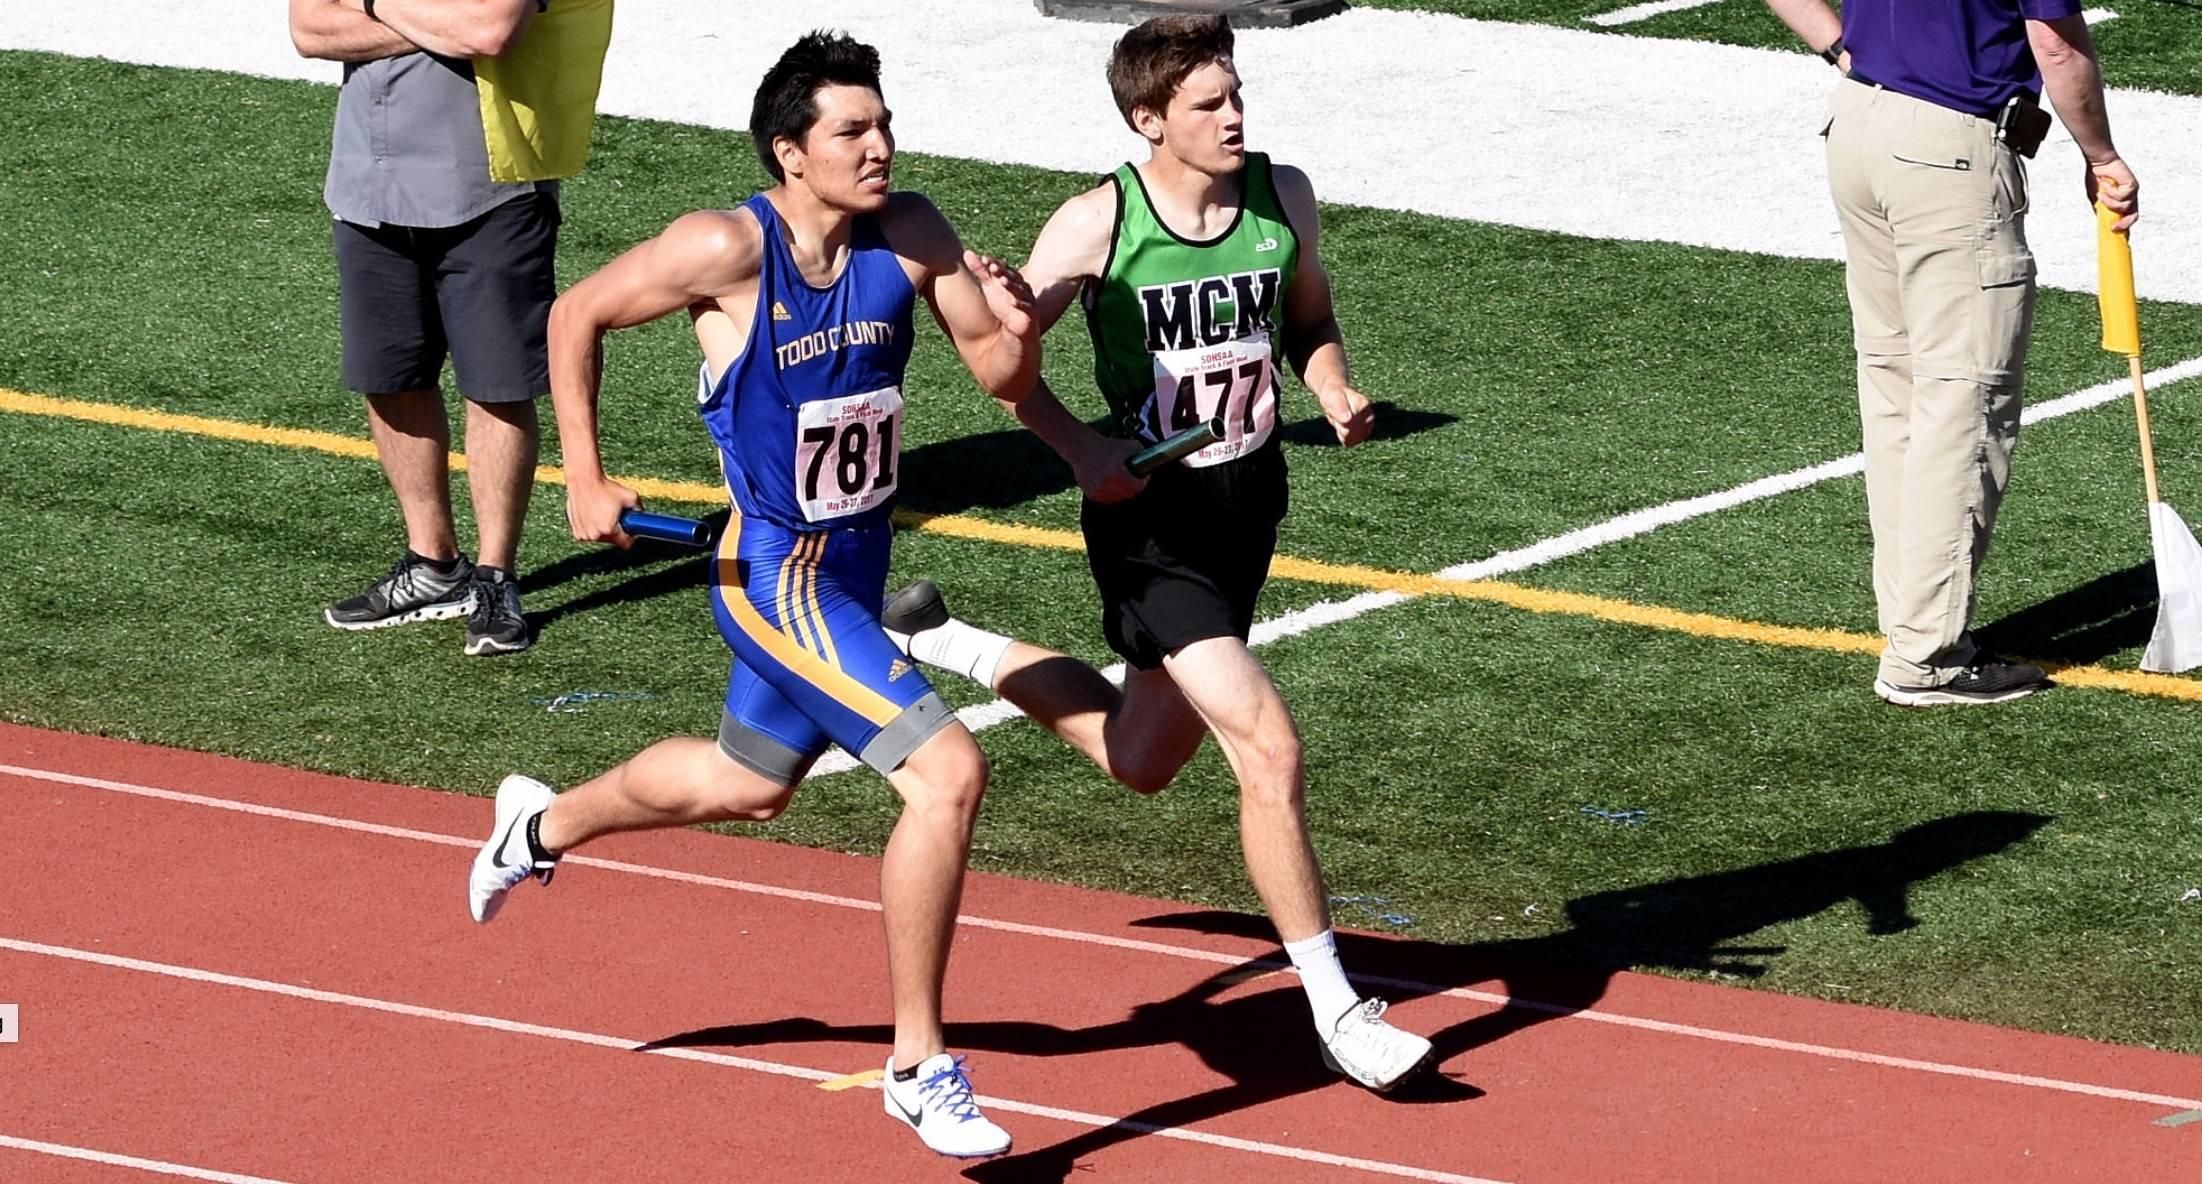 Track runners